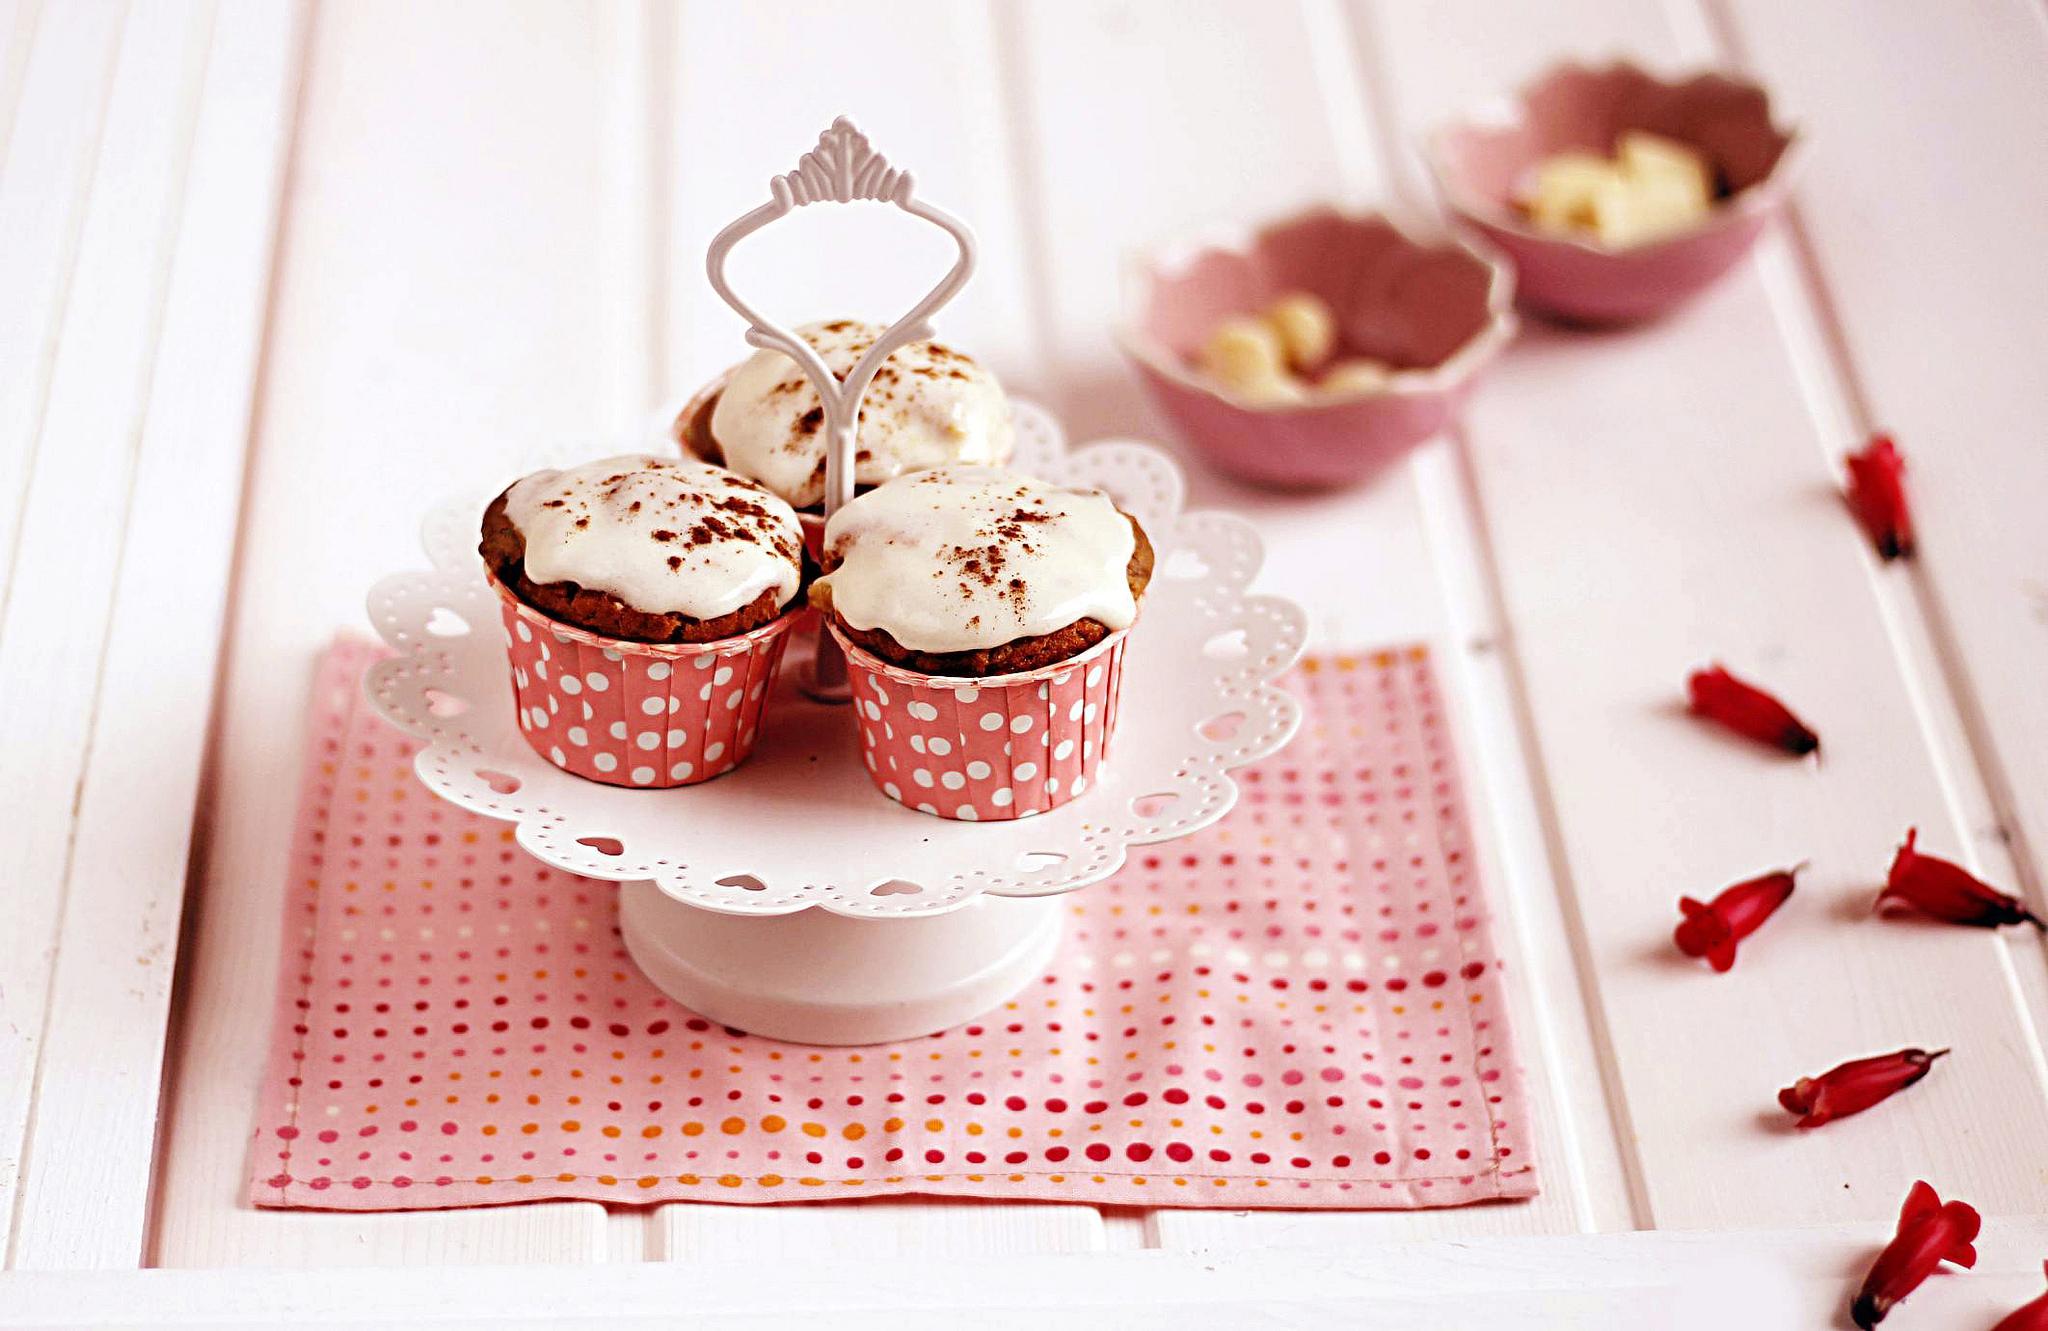 Cupcake Iphone Wallpaper Cupcake Full Hd Fond D 233 Cran And Arri 232 Re Plan 2048x1331